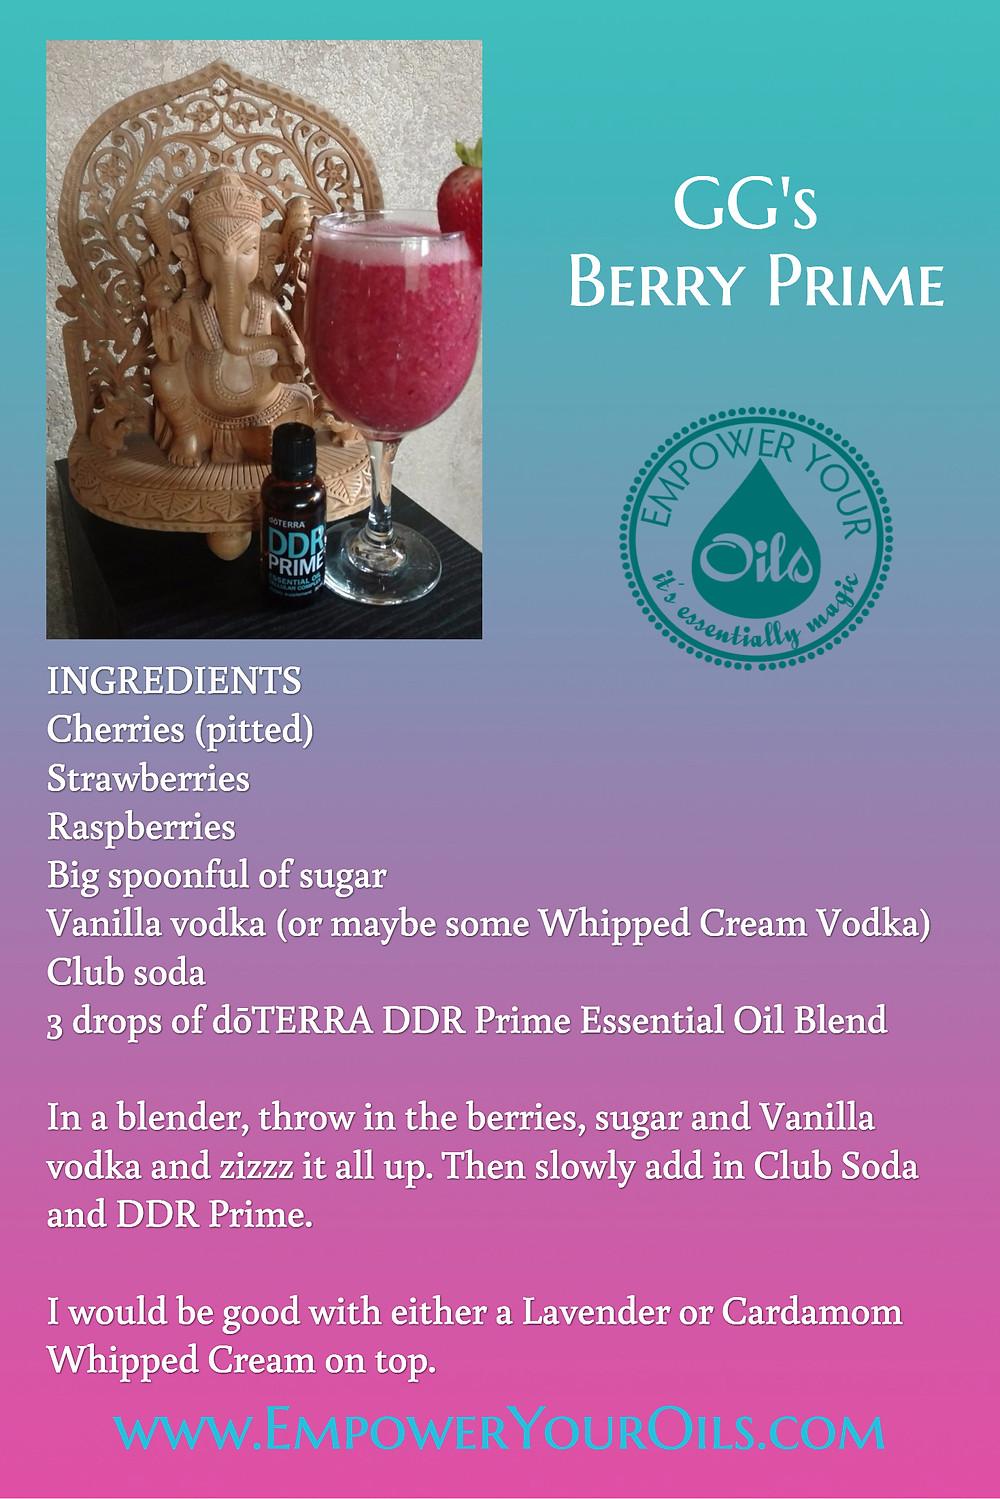 GG's Berry Prime